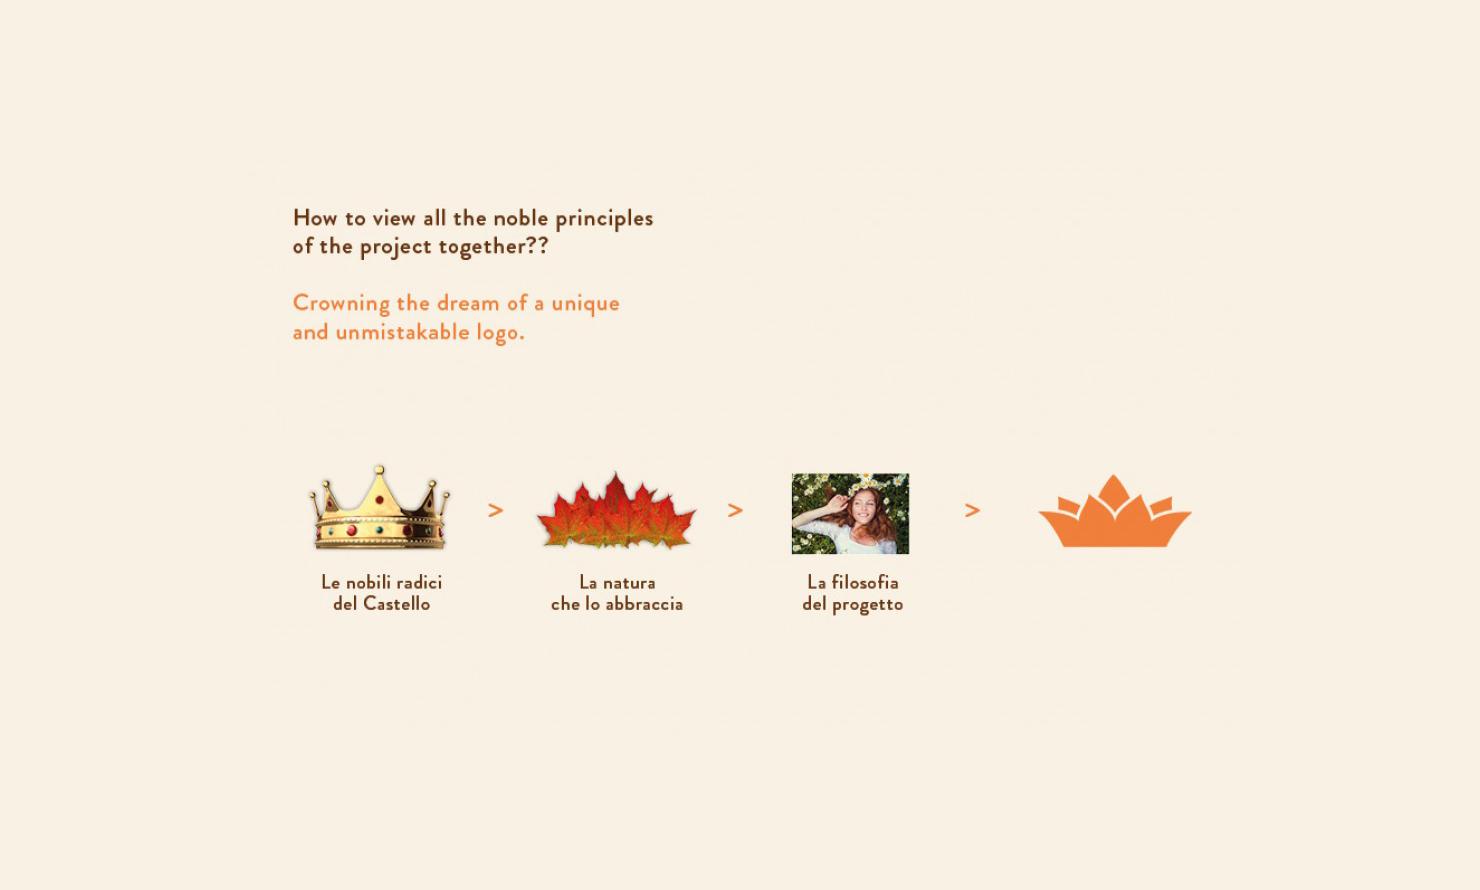 https://kubelibre.com/uploads/Slider-work-tutti-clienti/manital-vistaterra-l-agriparco-che-abbraccia-il-castello-brand-identity-brand-strategy-7.jpg